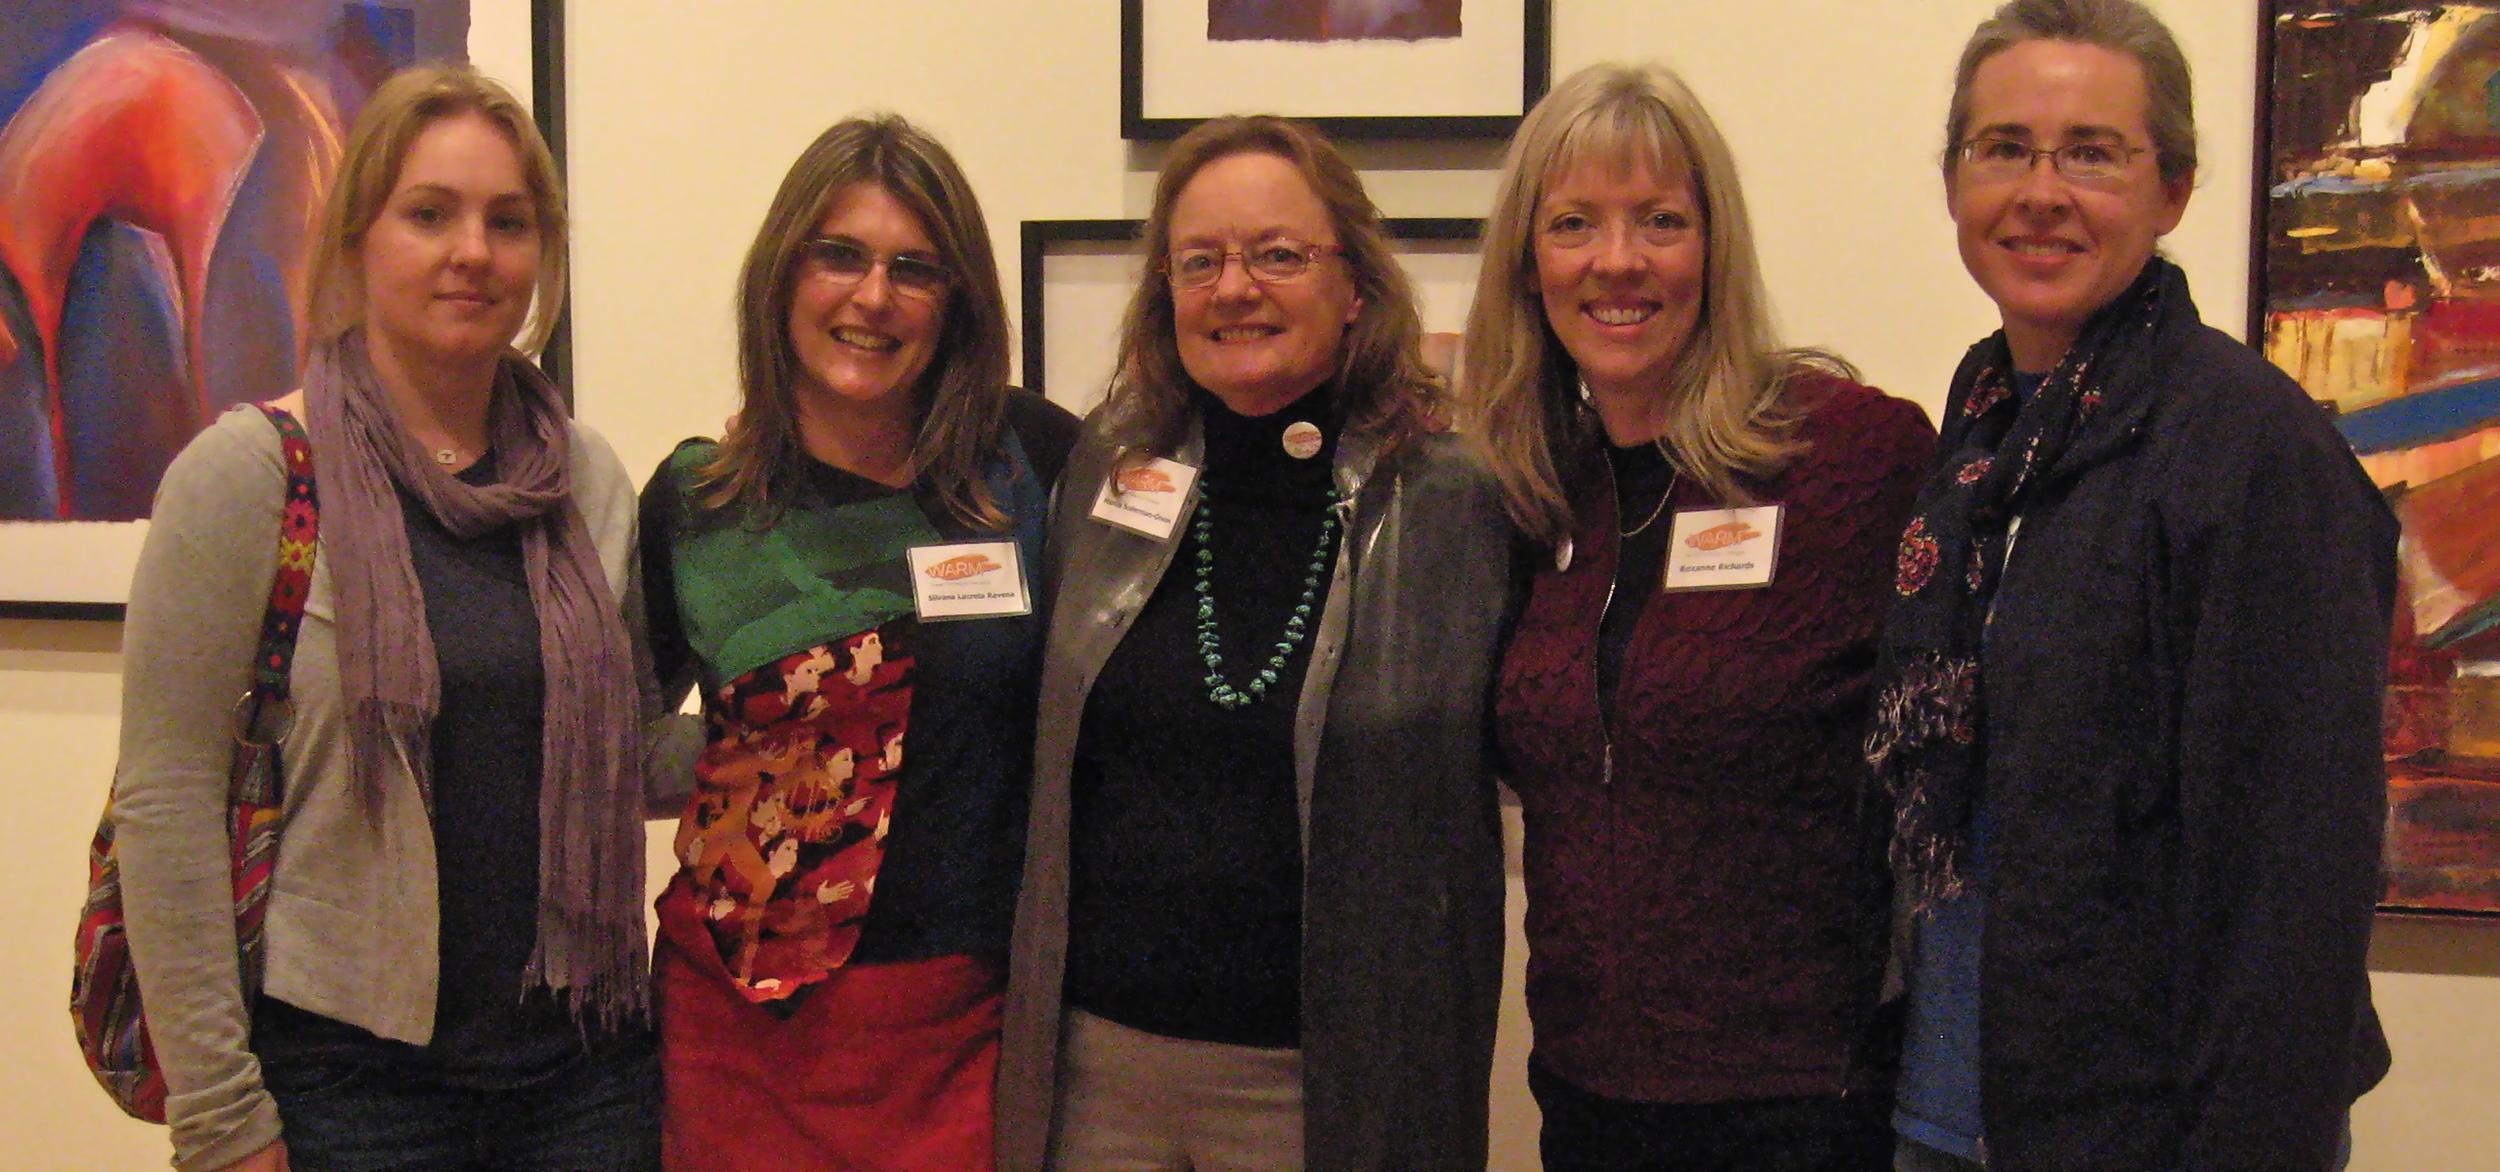 Marcia (center) with WARM protogées at Mentor-Protogée exhibit, Bloomington Art Center, MN, December 2010. Left to Right: Rashaun Kartak, Silvana LaCreta Ravena, the artist-mentor, Roxanne Richards, Mandy Chowen.